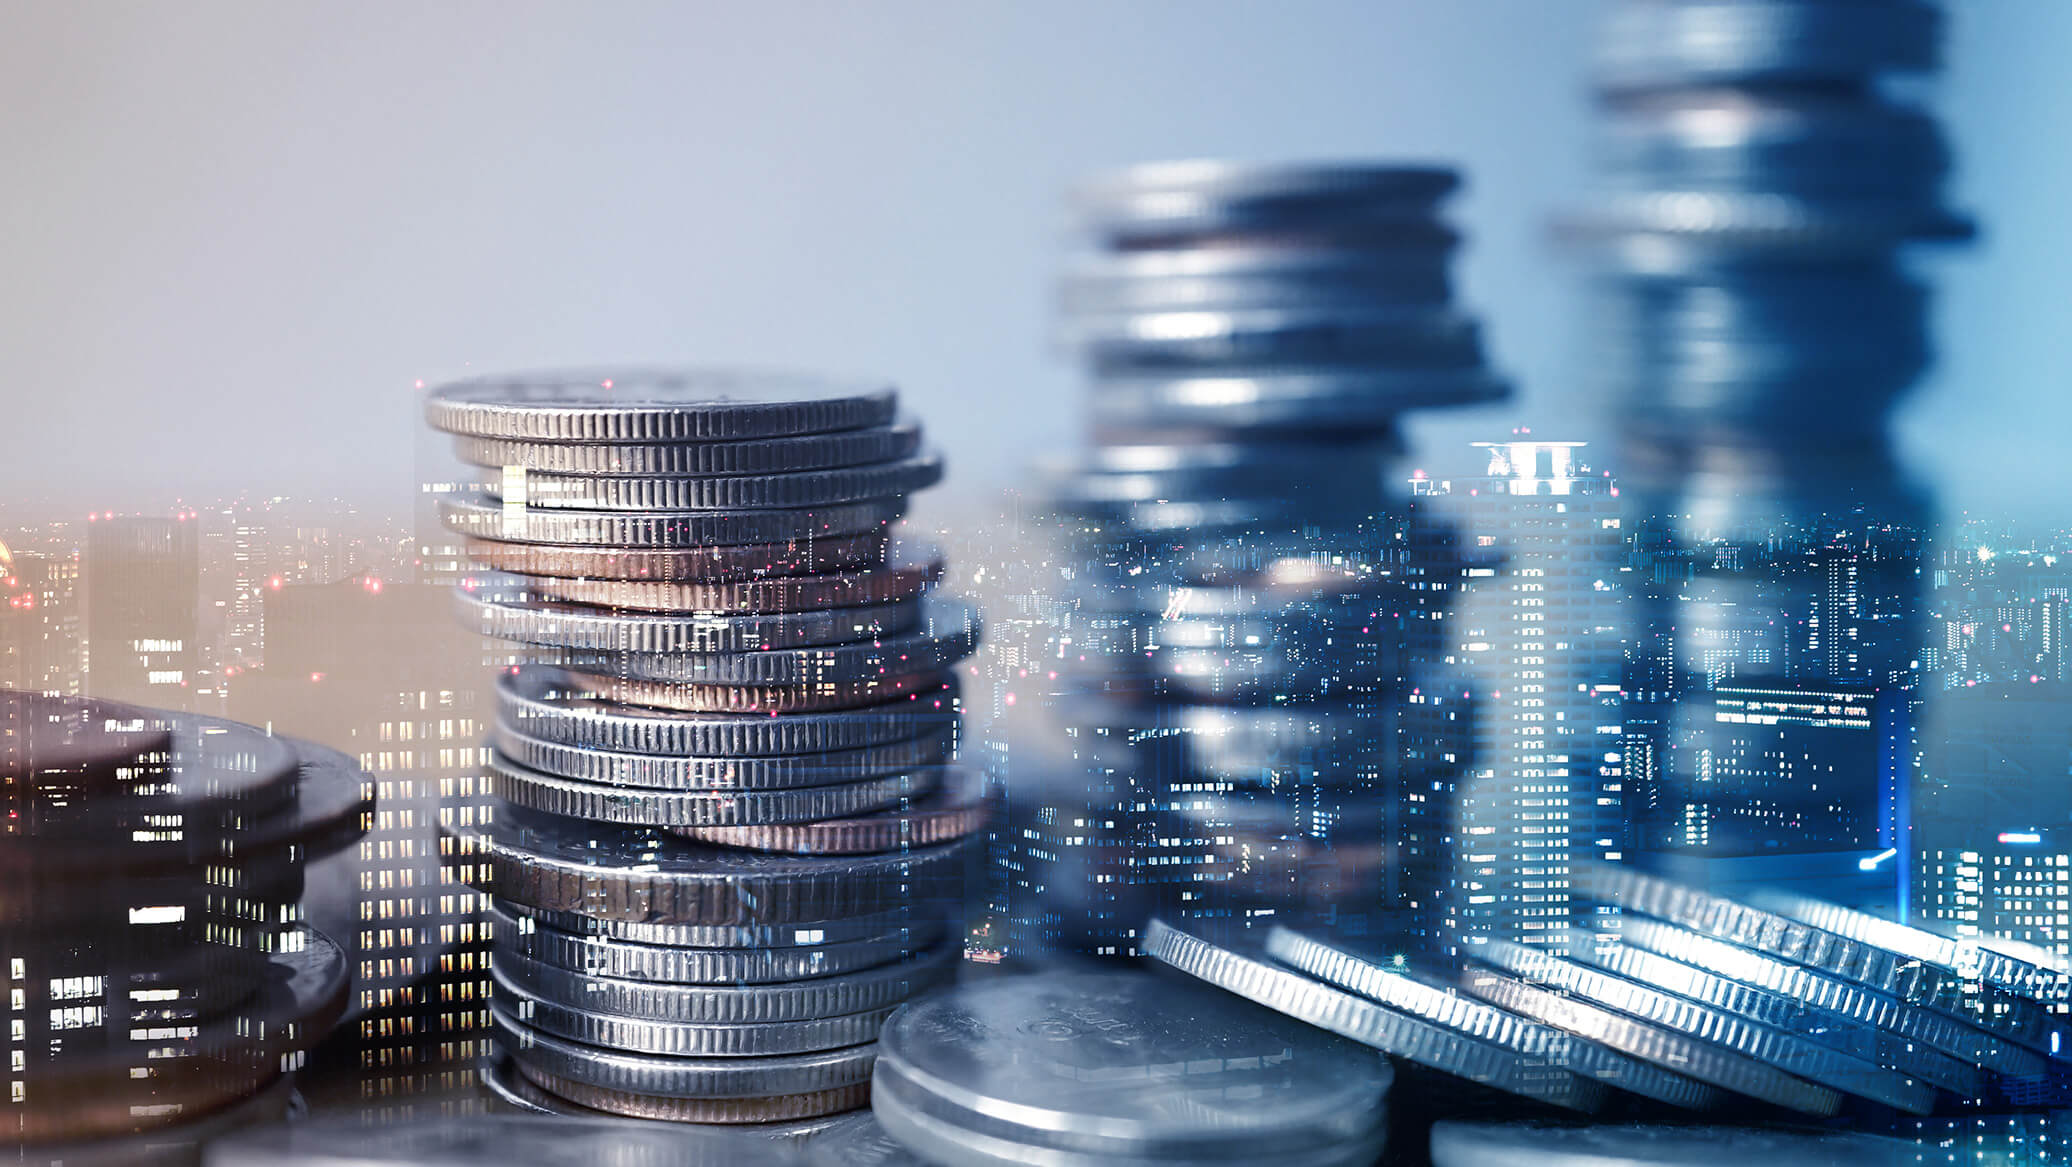 Digital Finance System